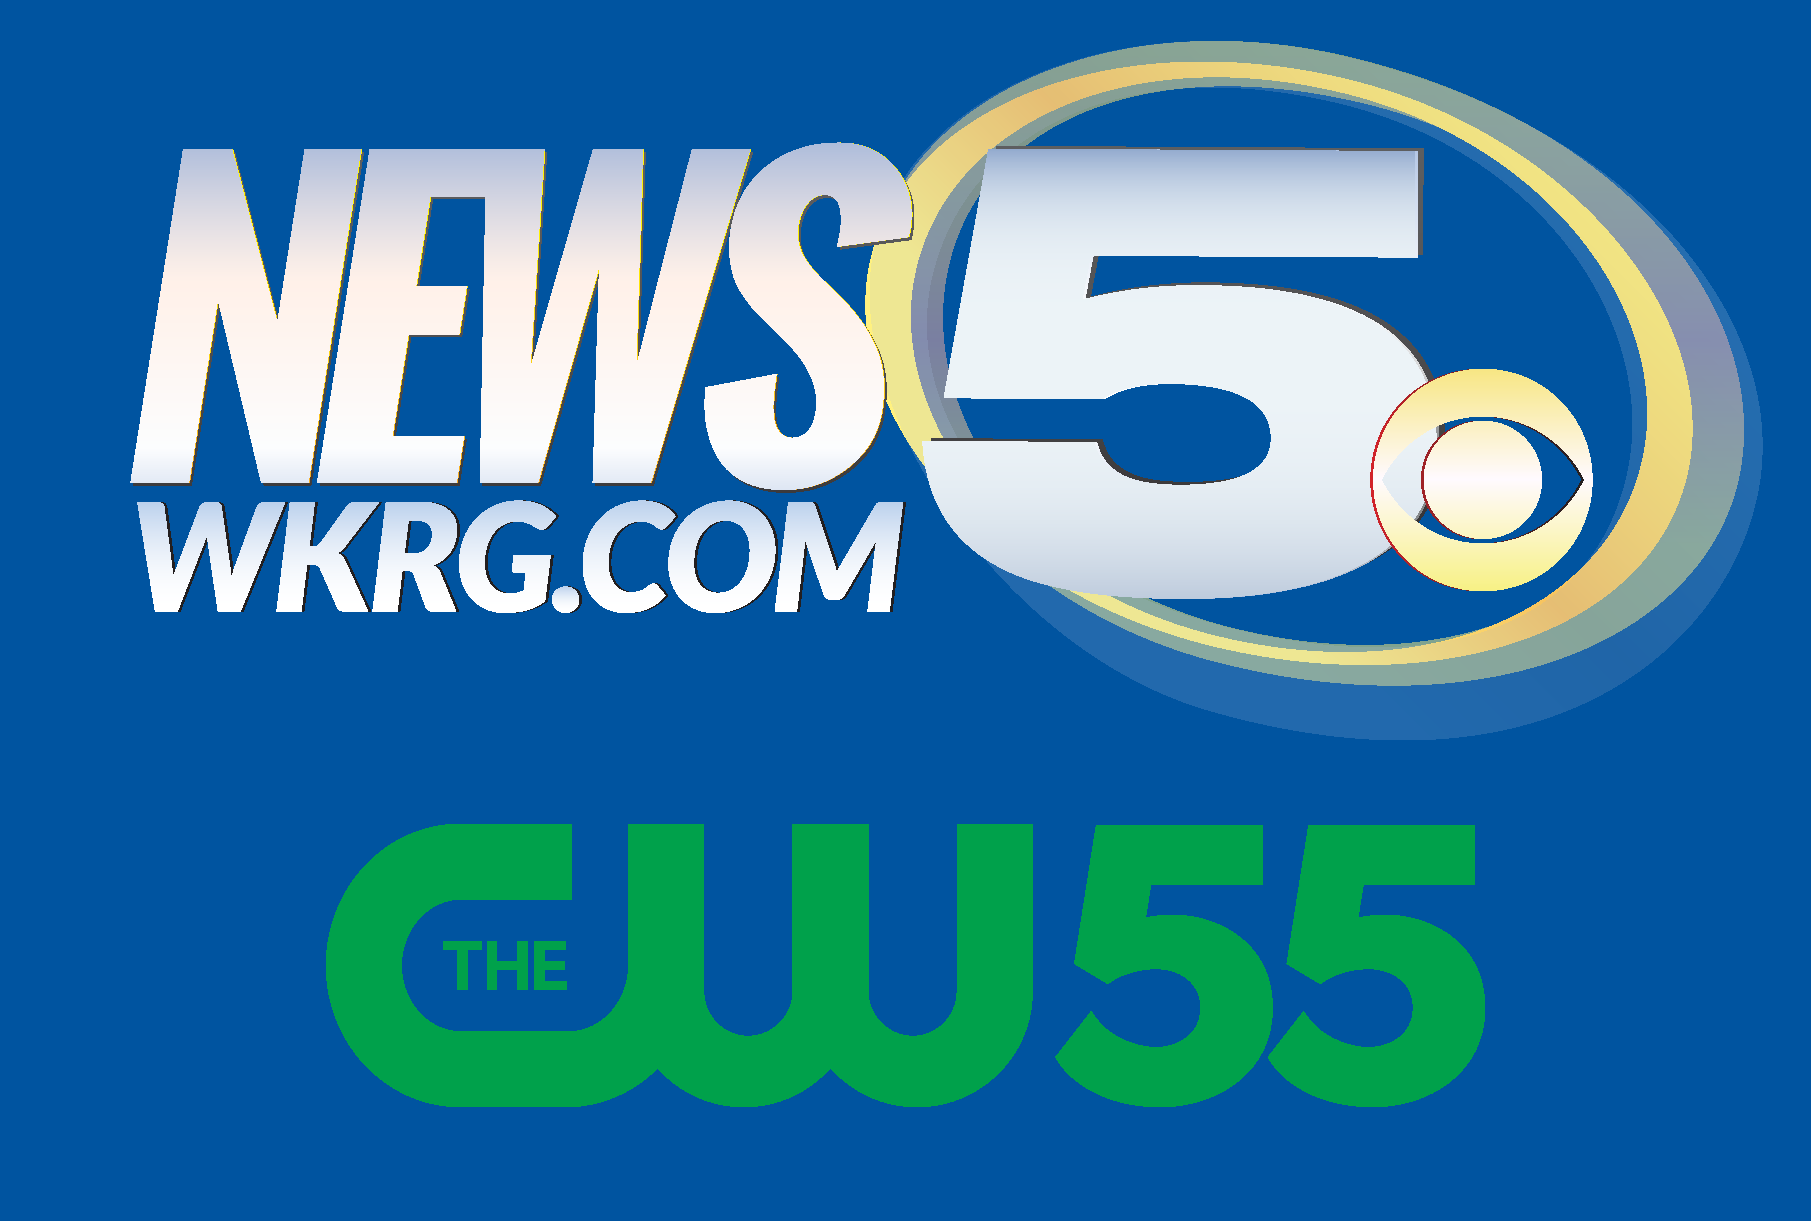 WKRG News 5 _CW55 Blue.png